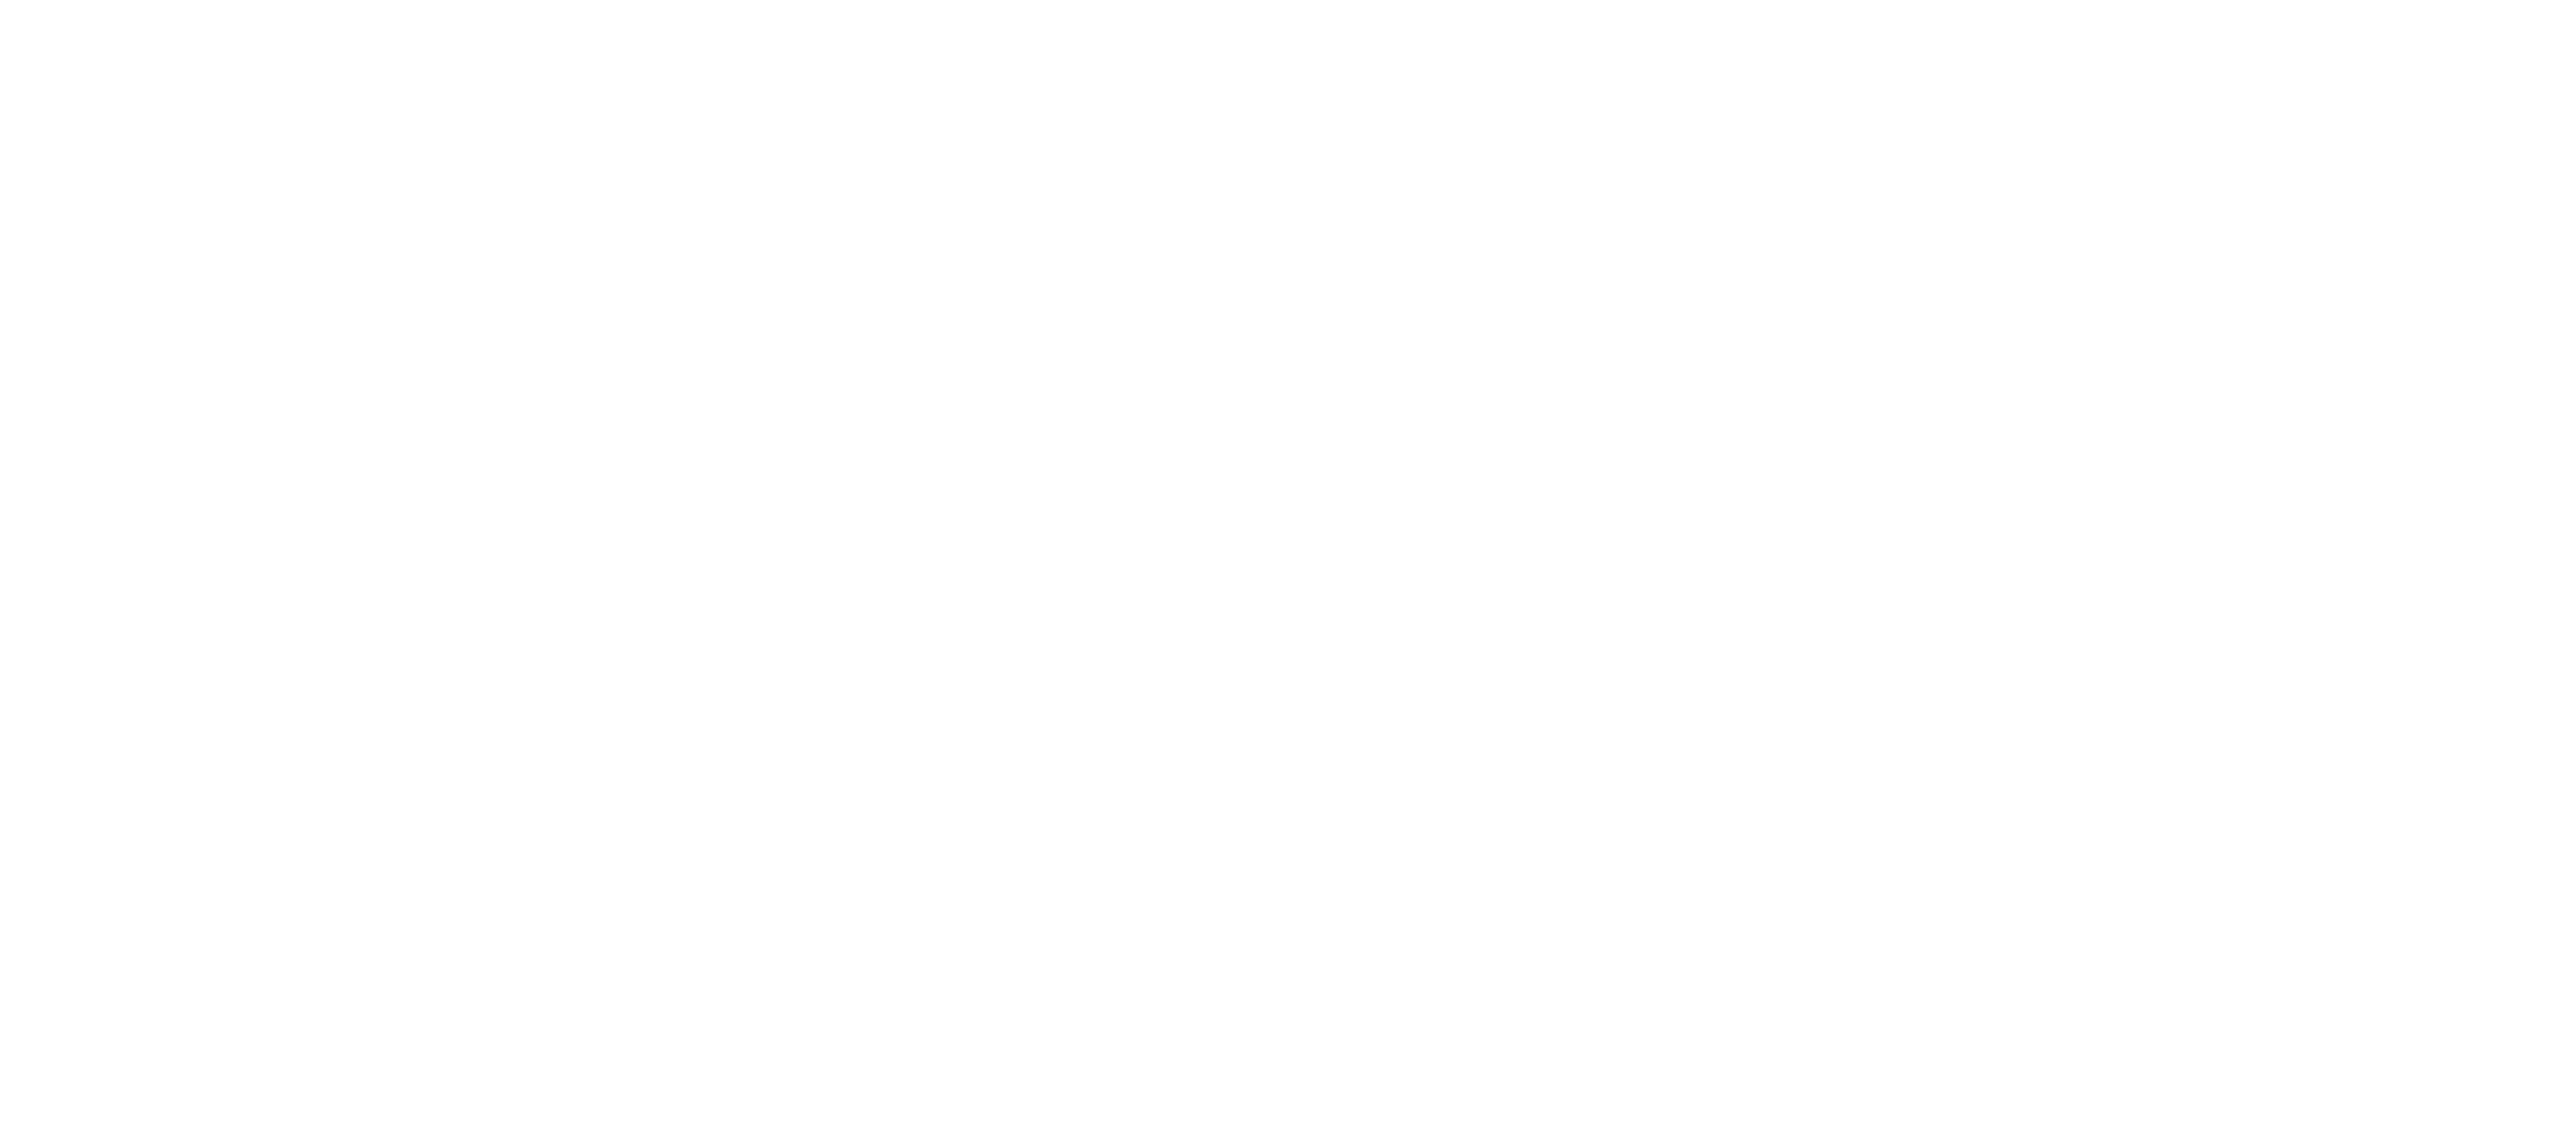 Surveyors Source